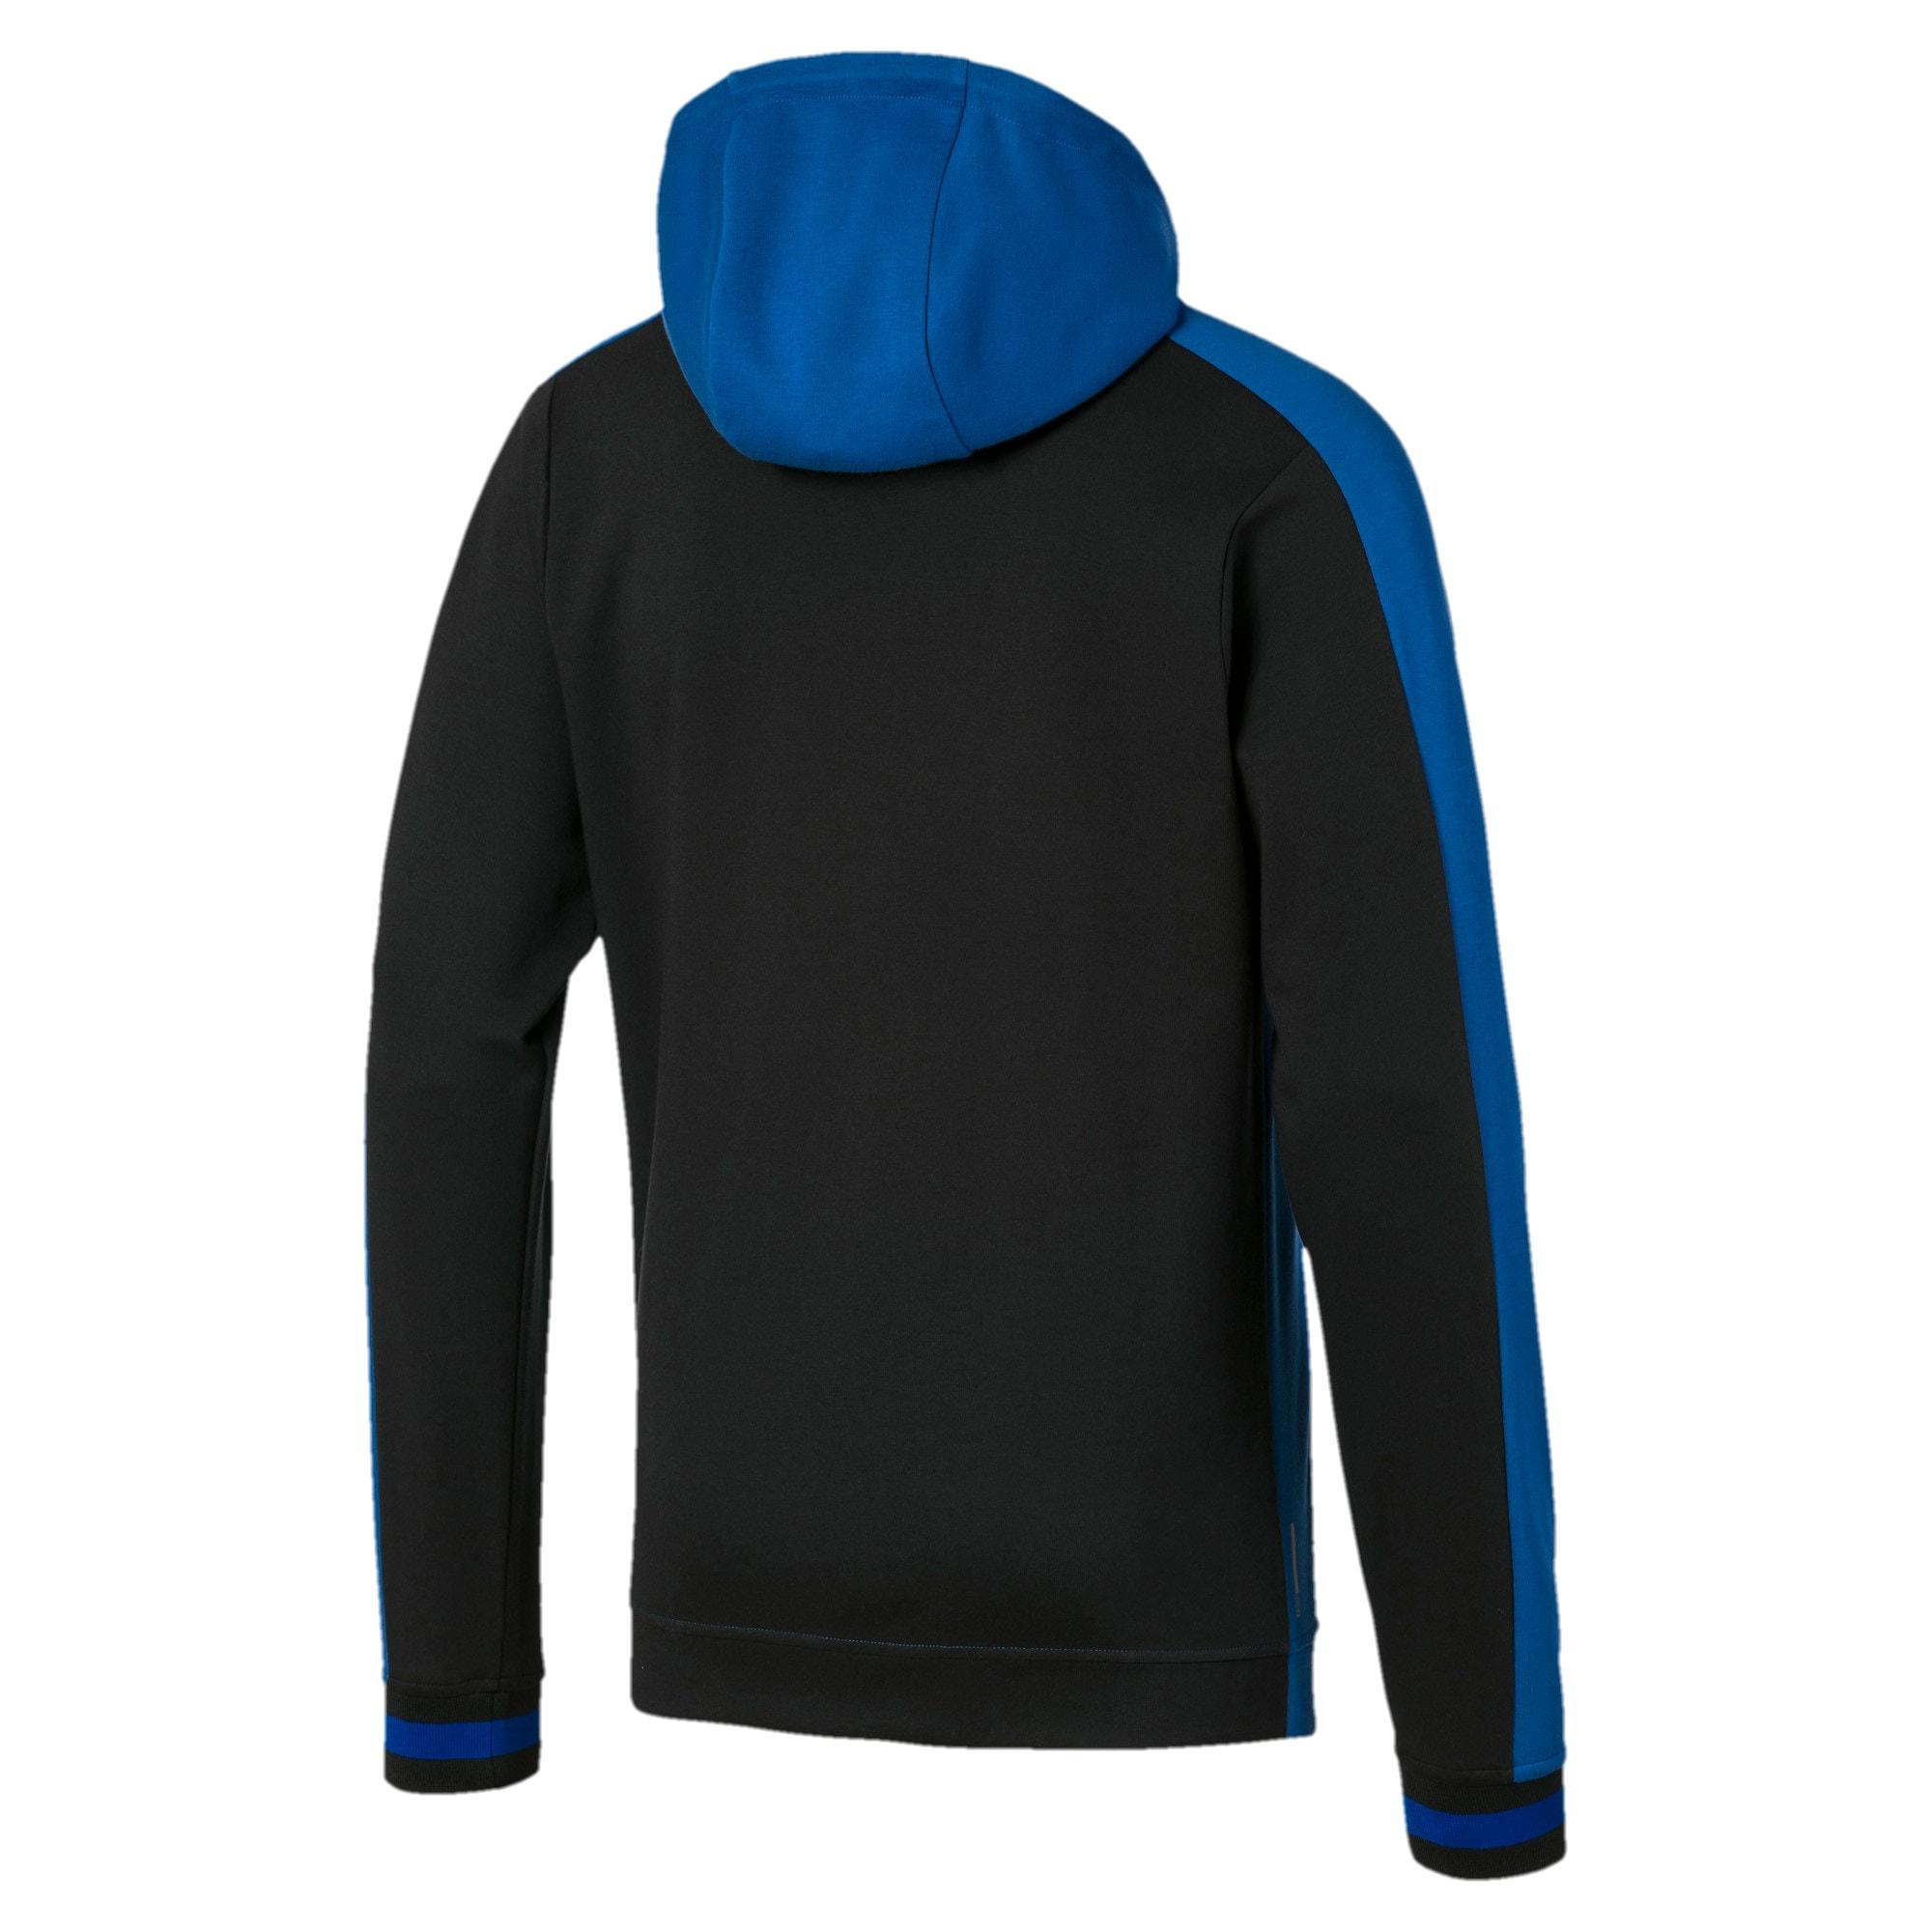 Thumbnail 5 of Collective Men's Hoodie, Galaxy Blue-Puma Black, medium